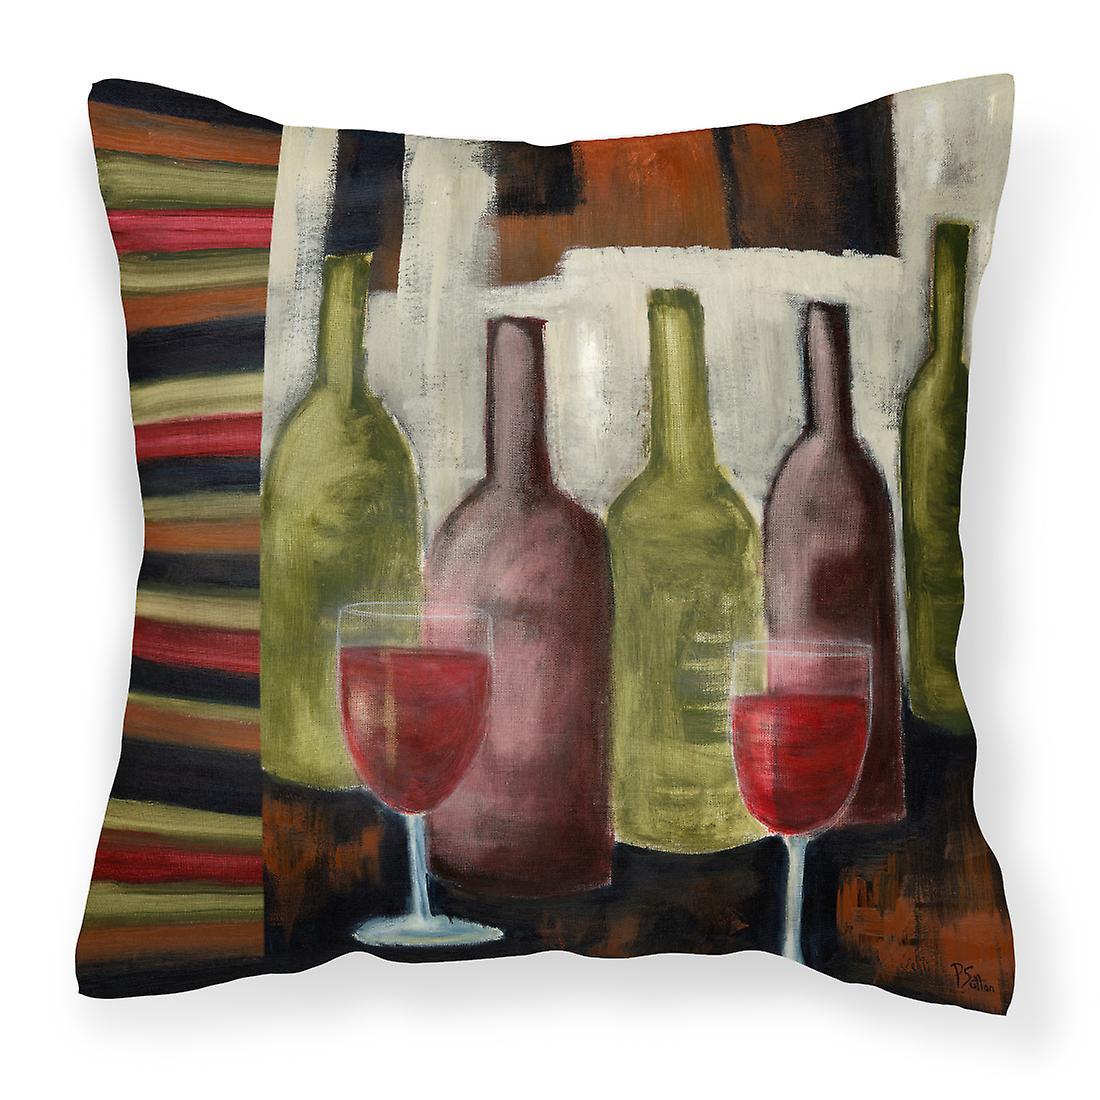 Vin Sutton Petrina De Décoratif Oreiller Rouge Toile DI2WEYH9